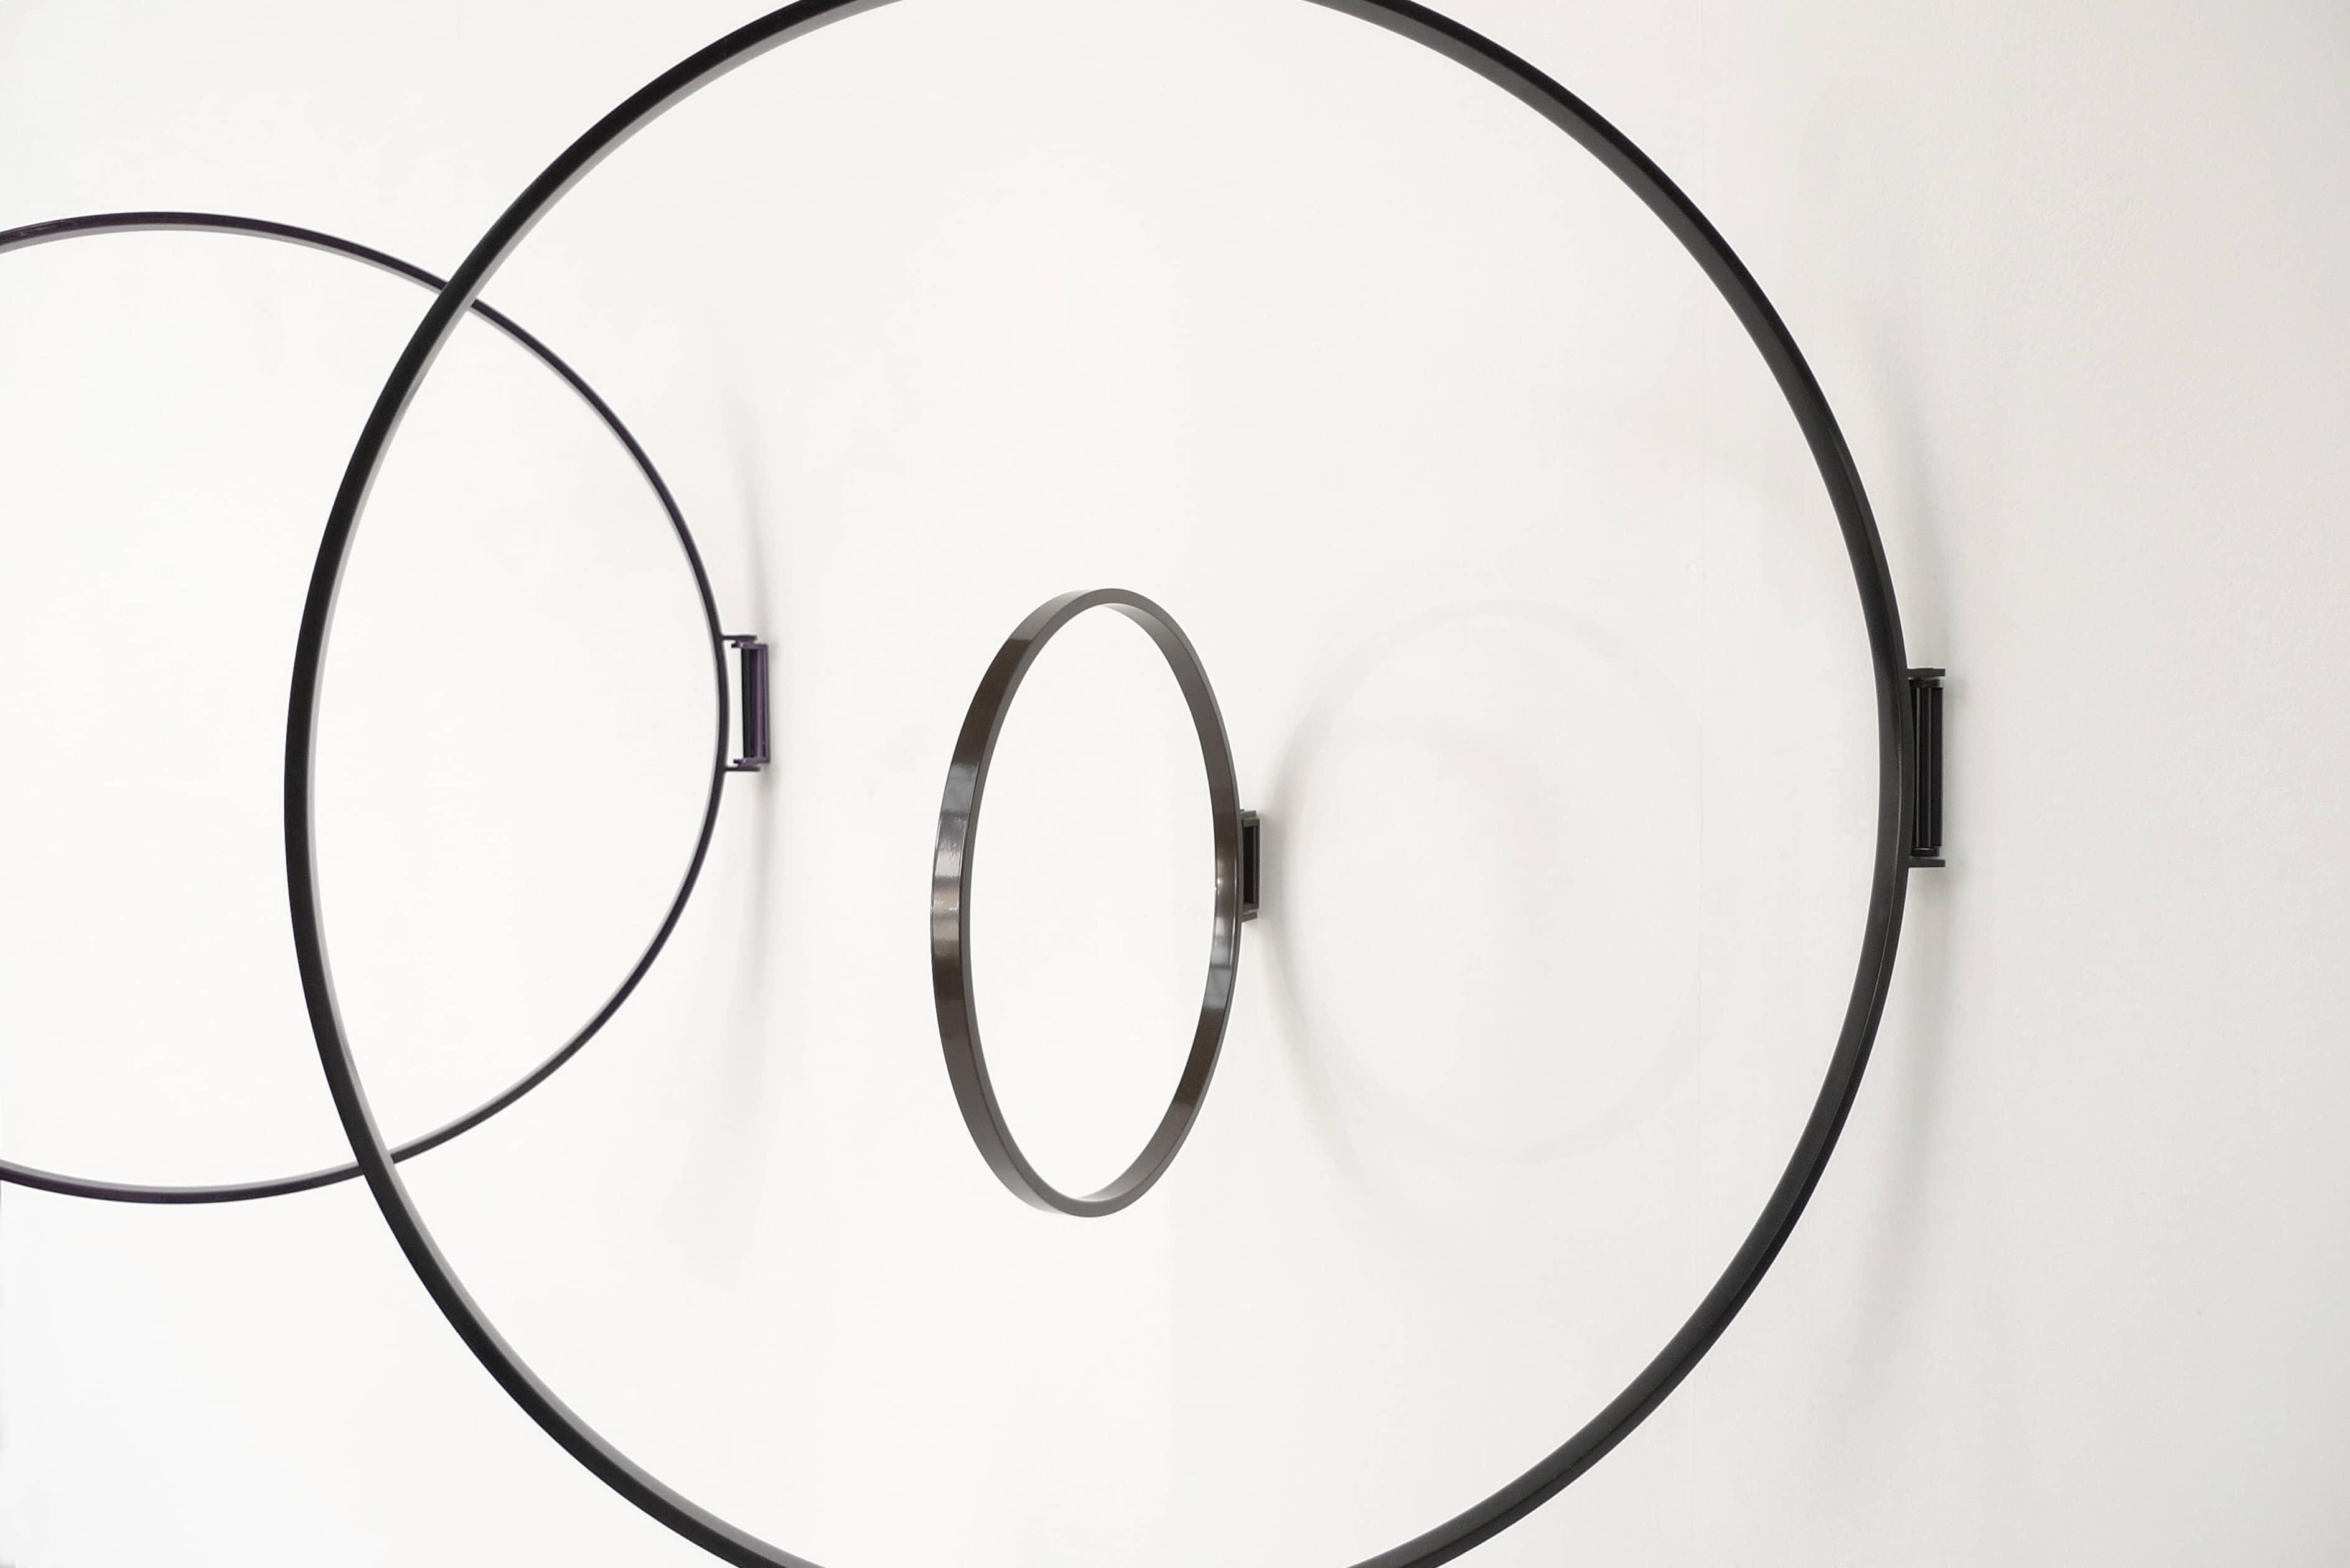 ringe-atelier haussmann-berlin design- Wandobjekt-Garderobe- Zascho Petkow-